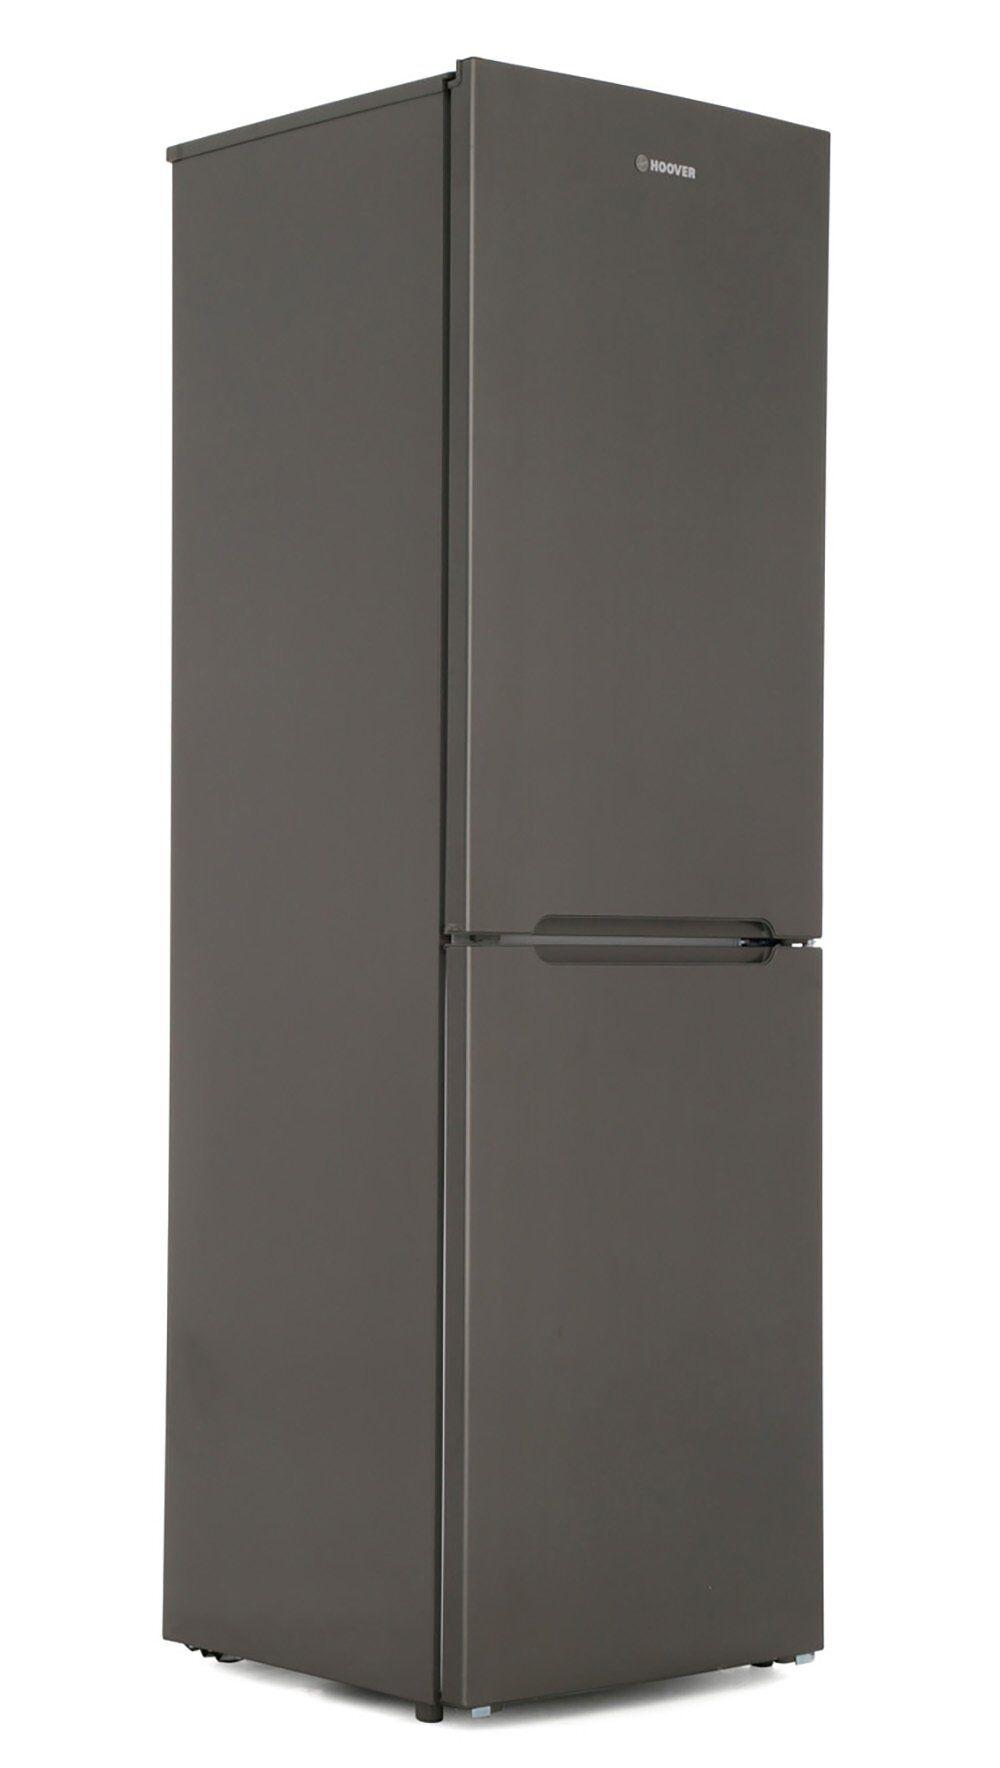 Hoover Frost Free Fridge Freezer - White - F Rated - HCF5172XK